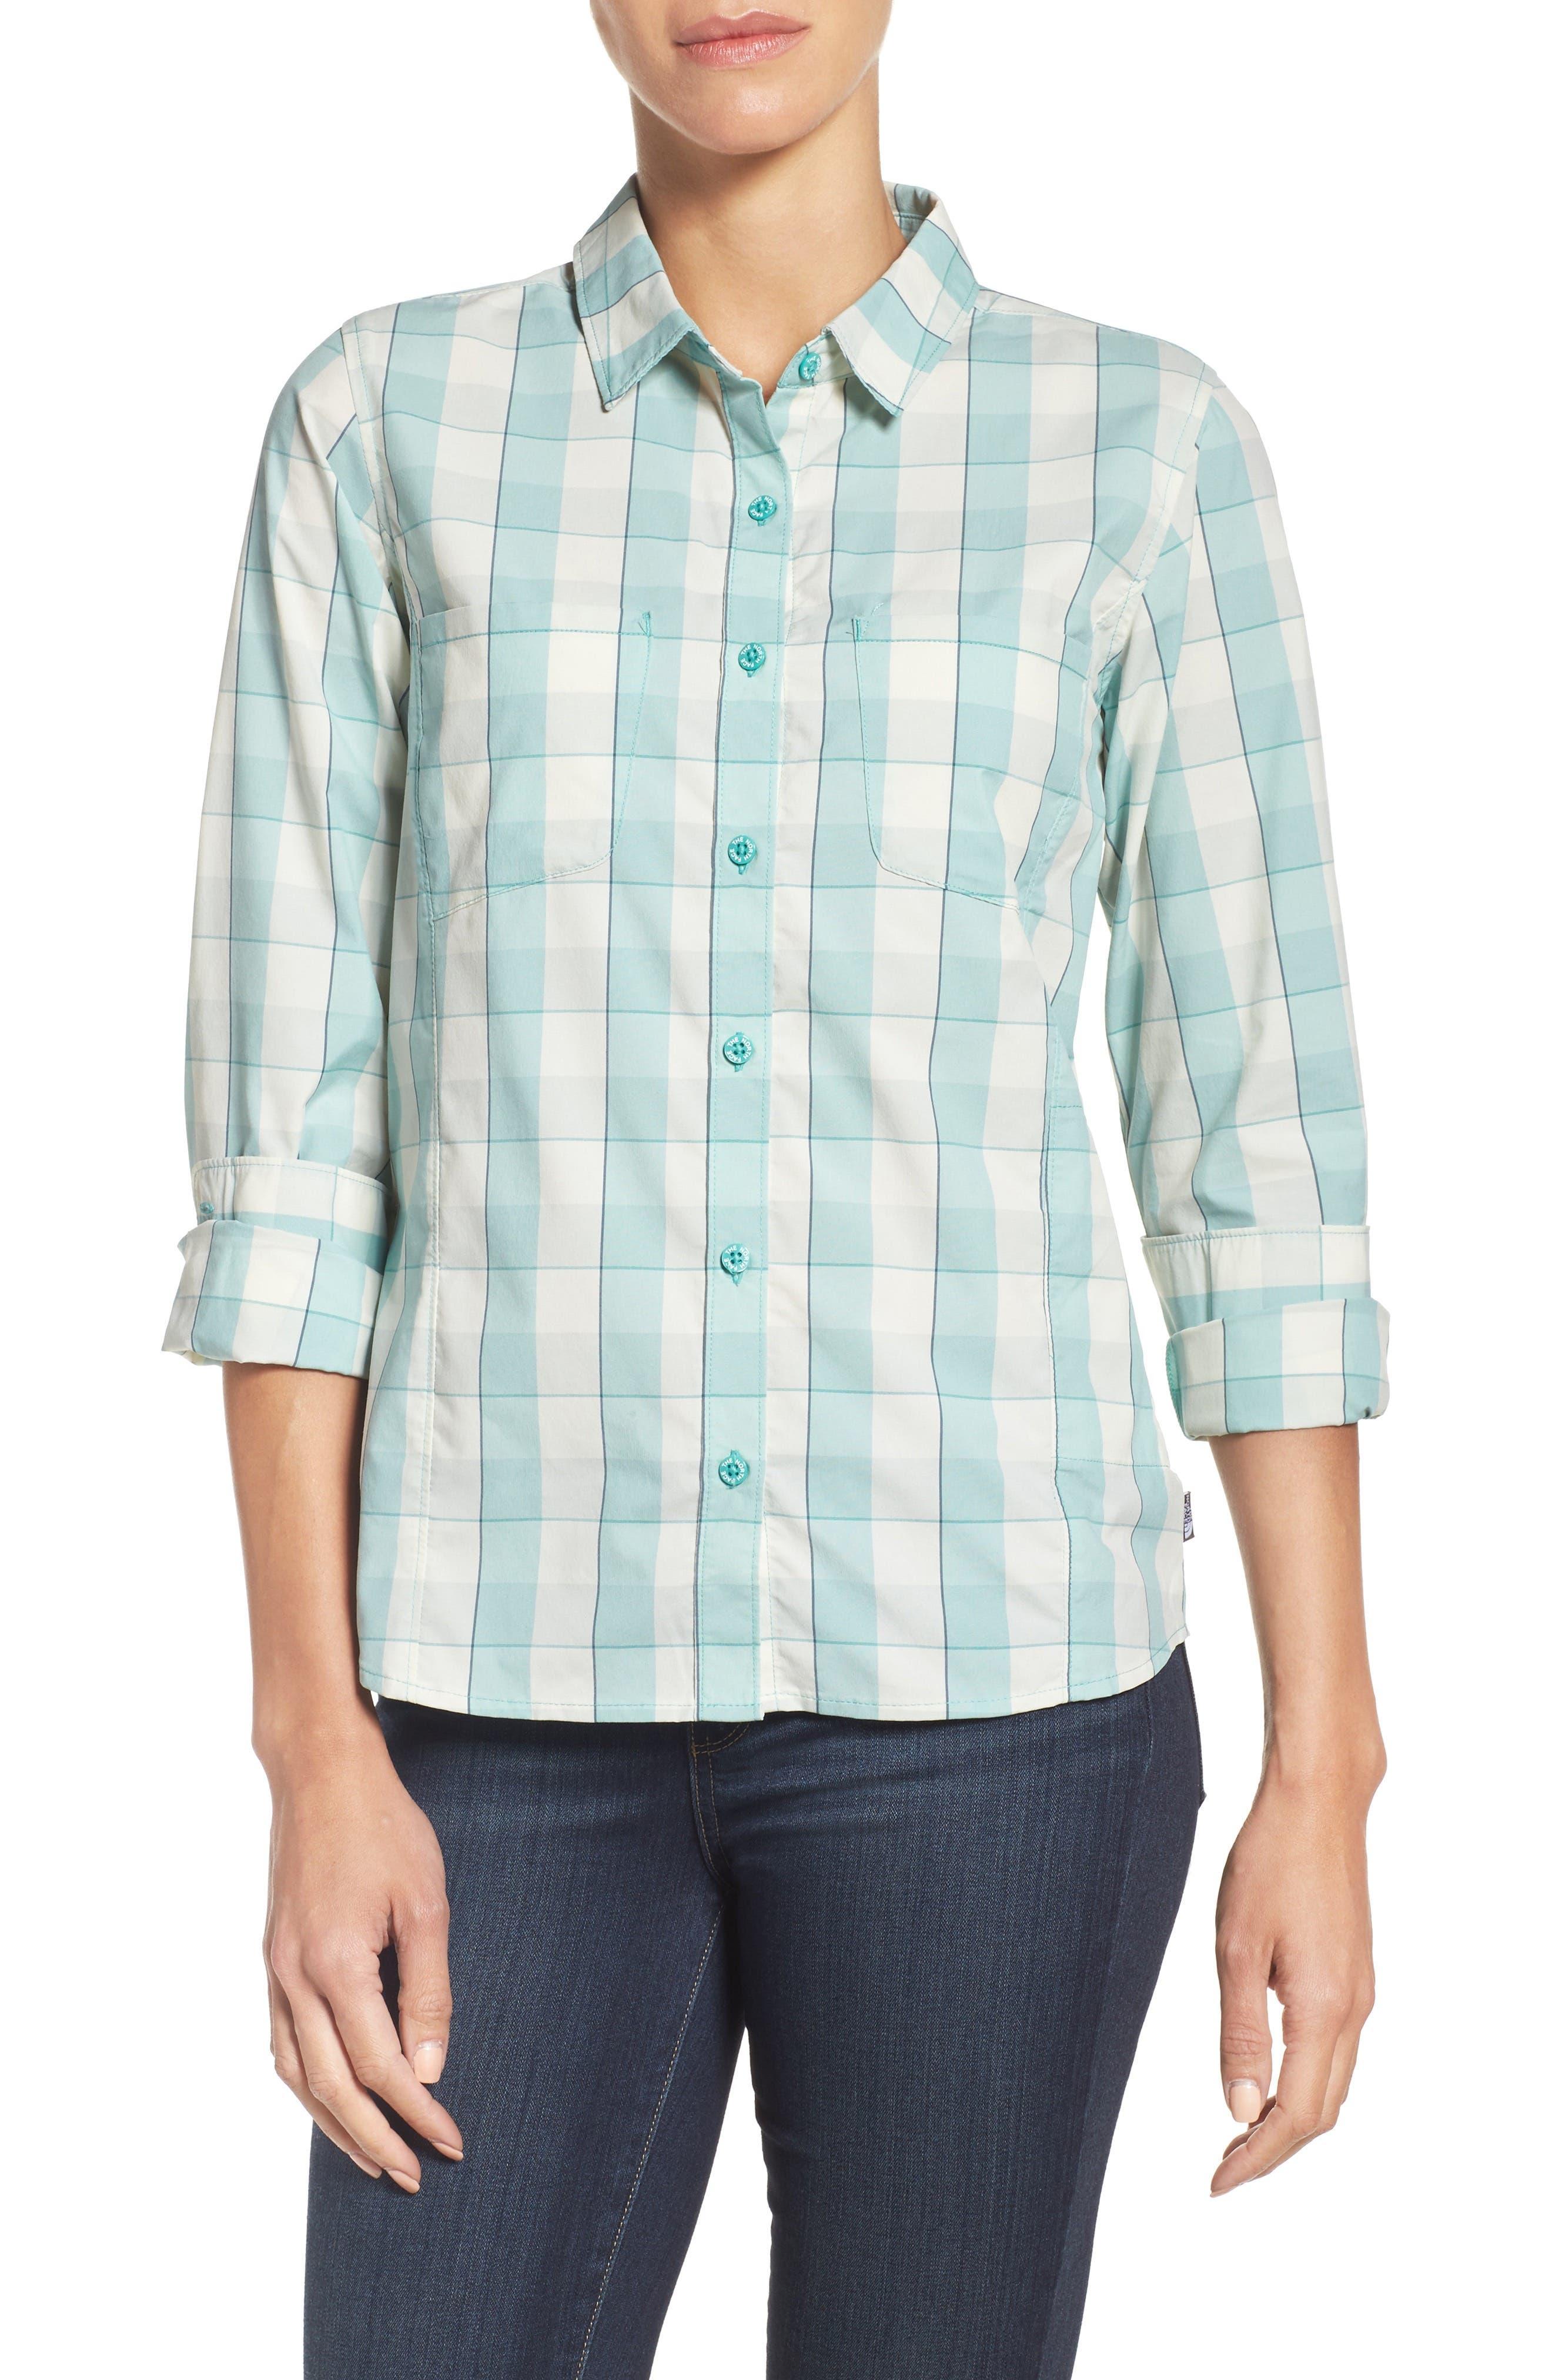 Main Image - The North Face Sunblocker Twill Shirt